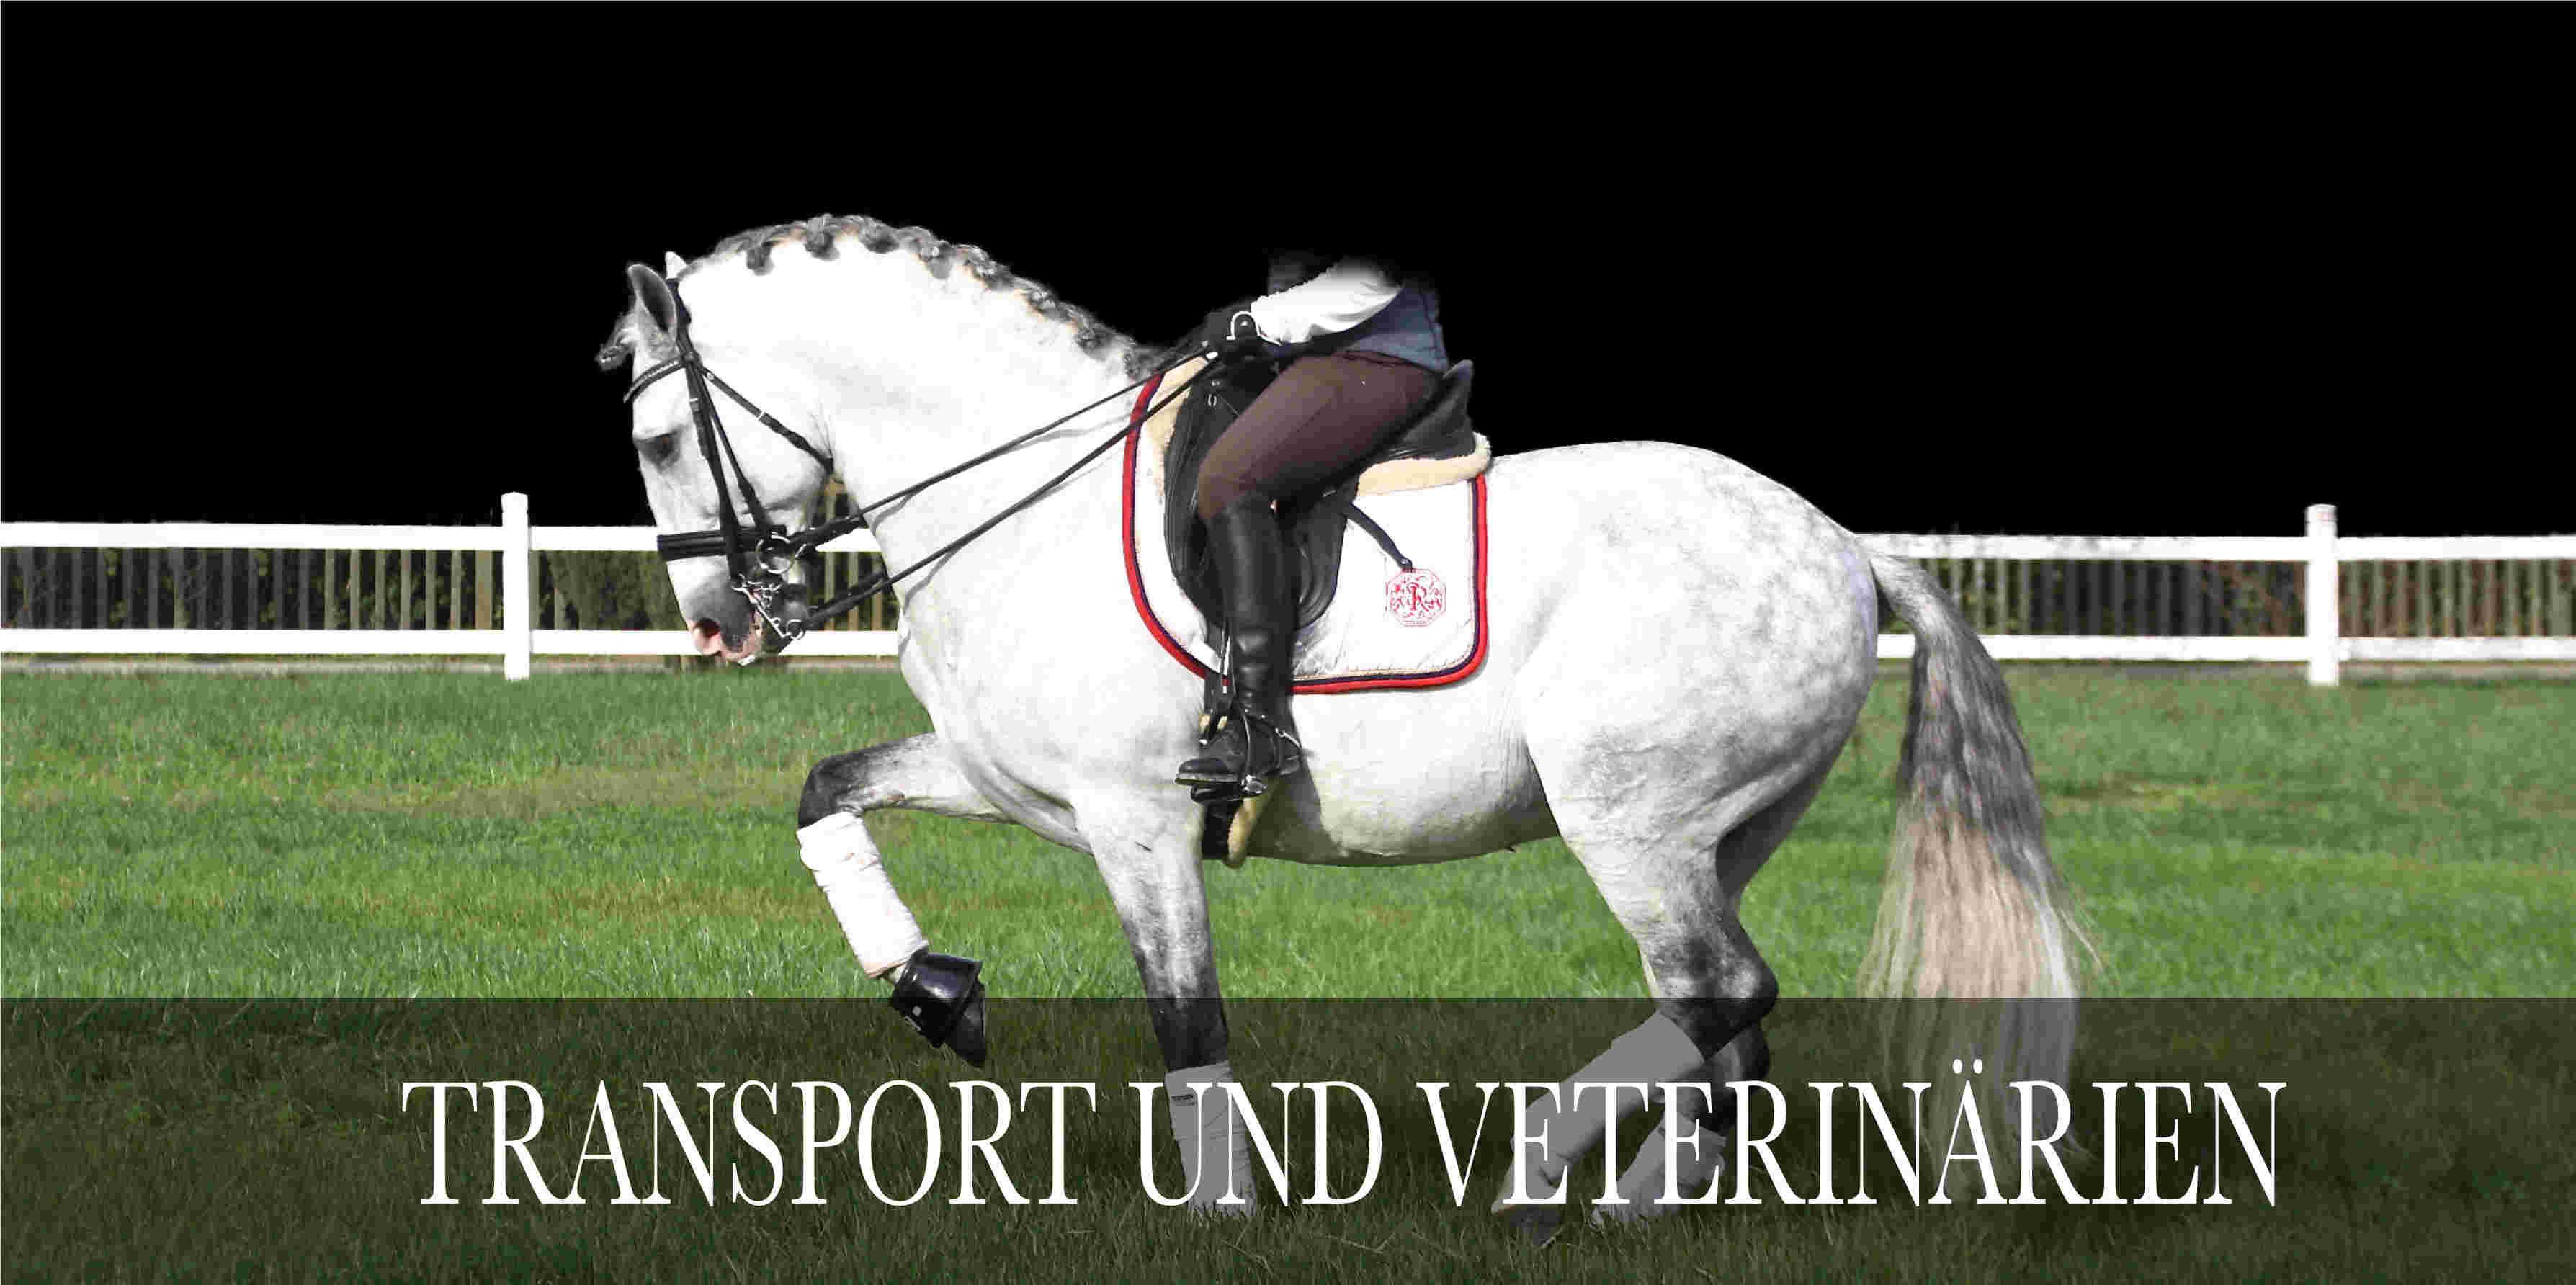 transport Pferde und veterinarien